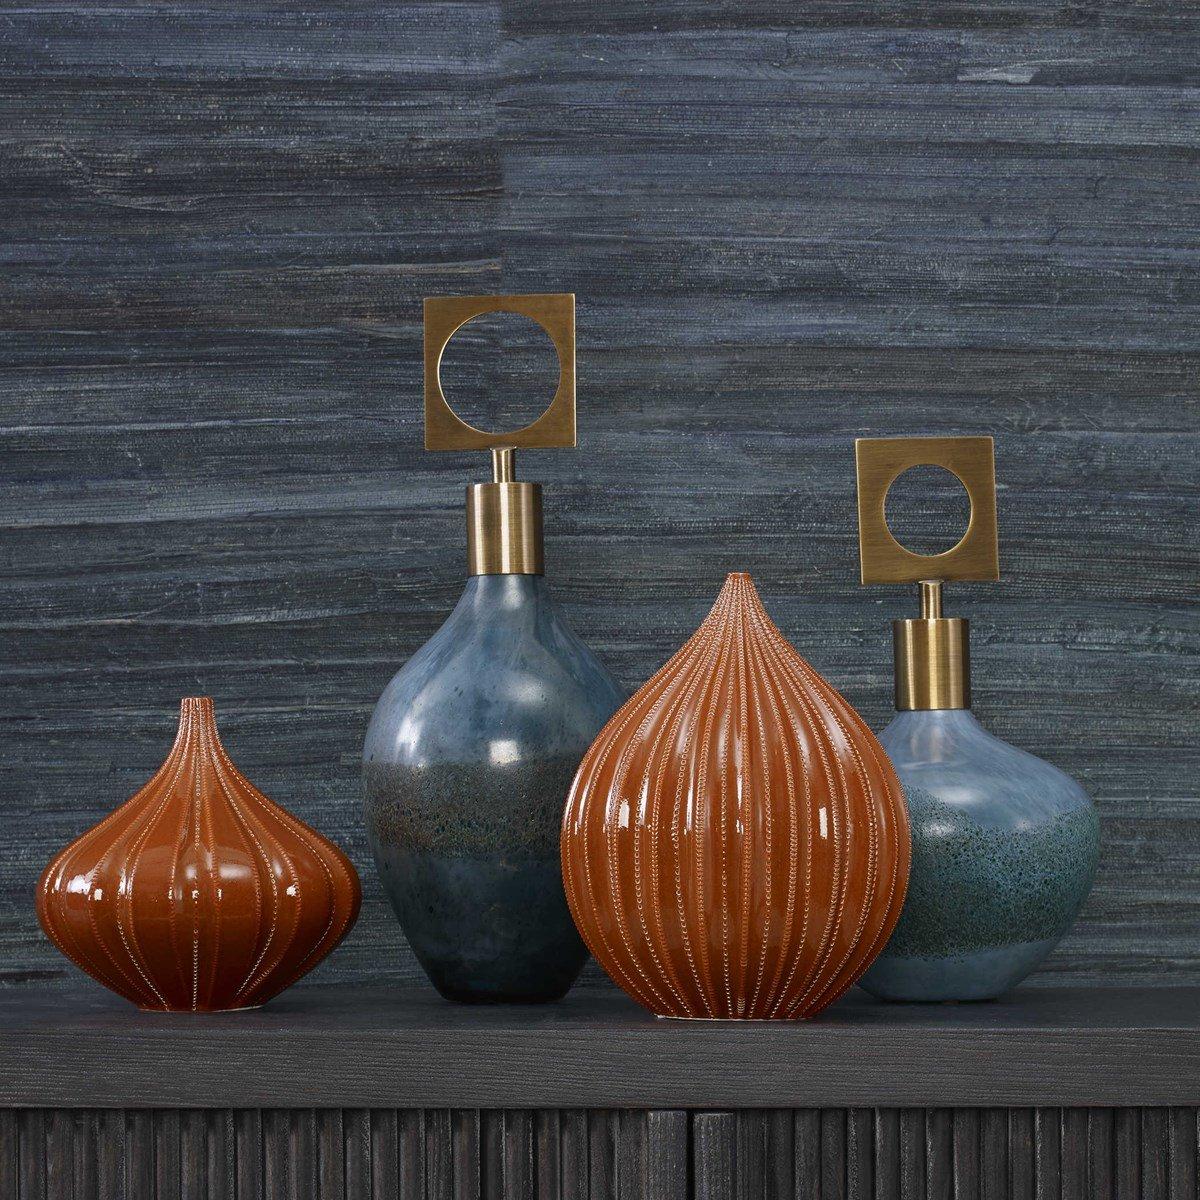 Glazed decorative bottles look both modern and retro